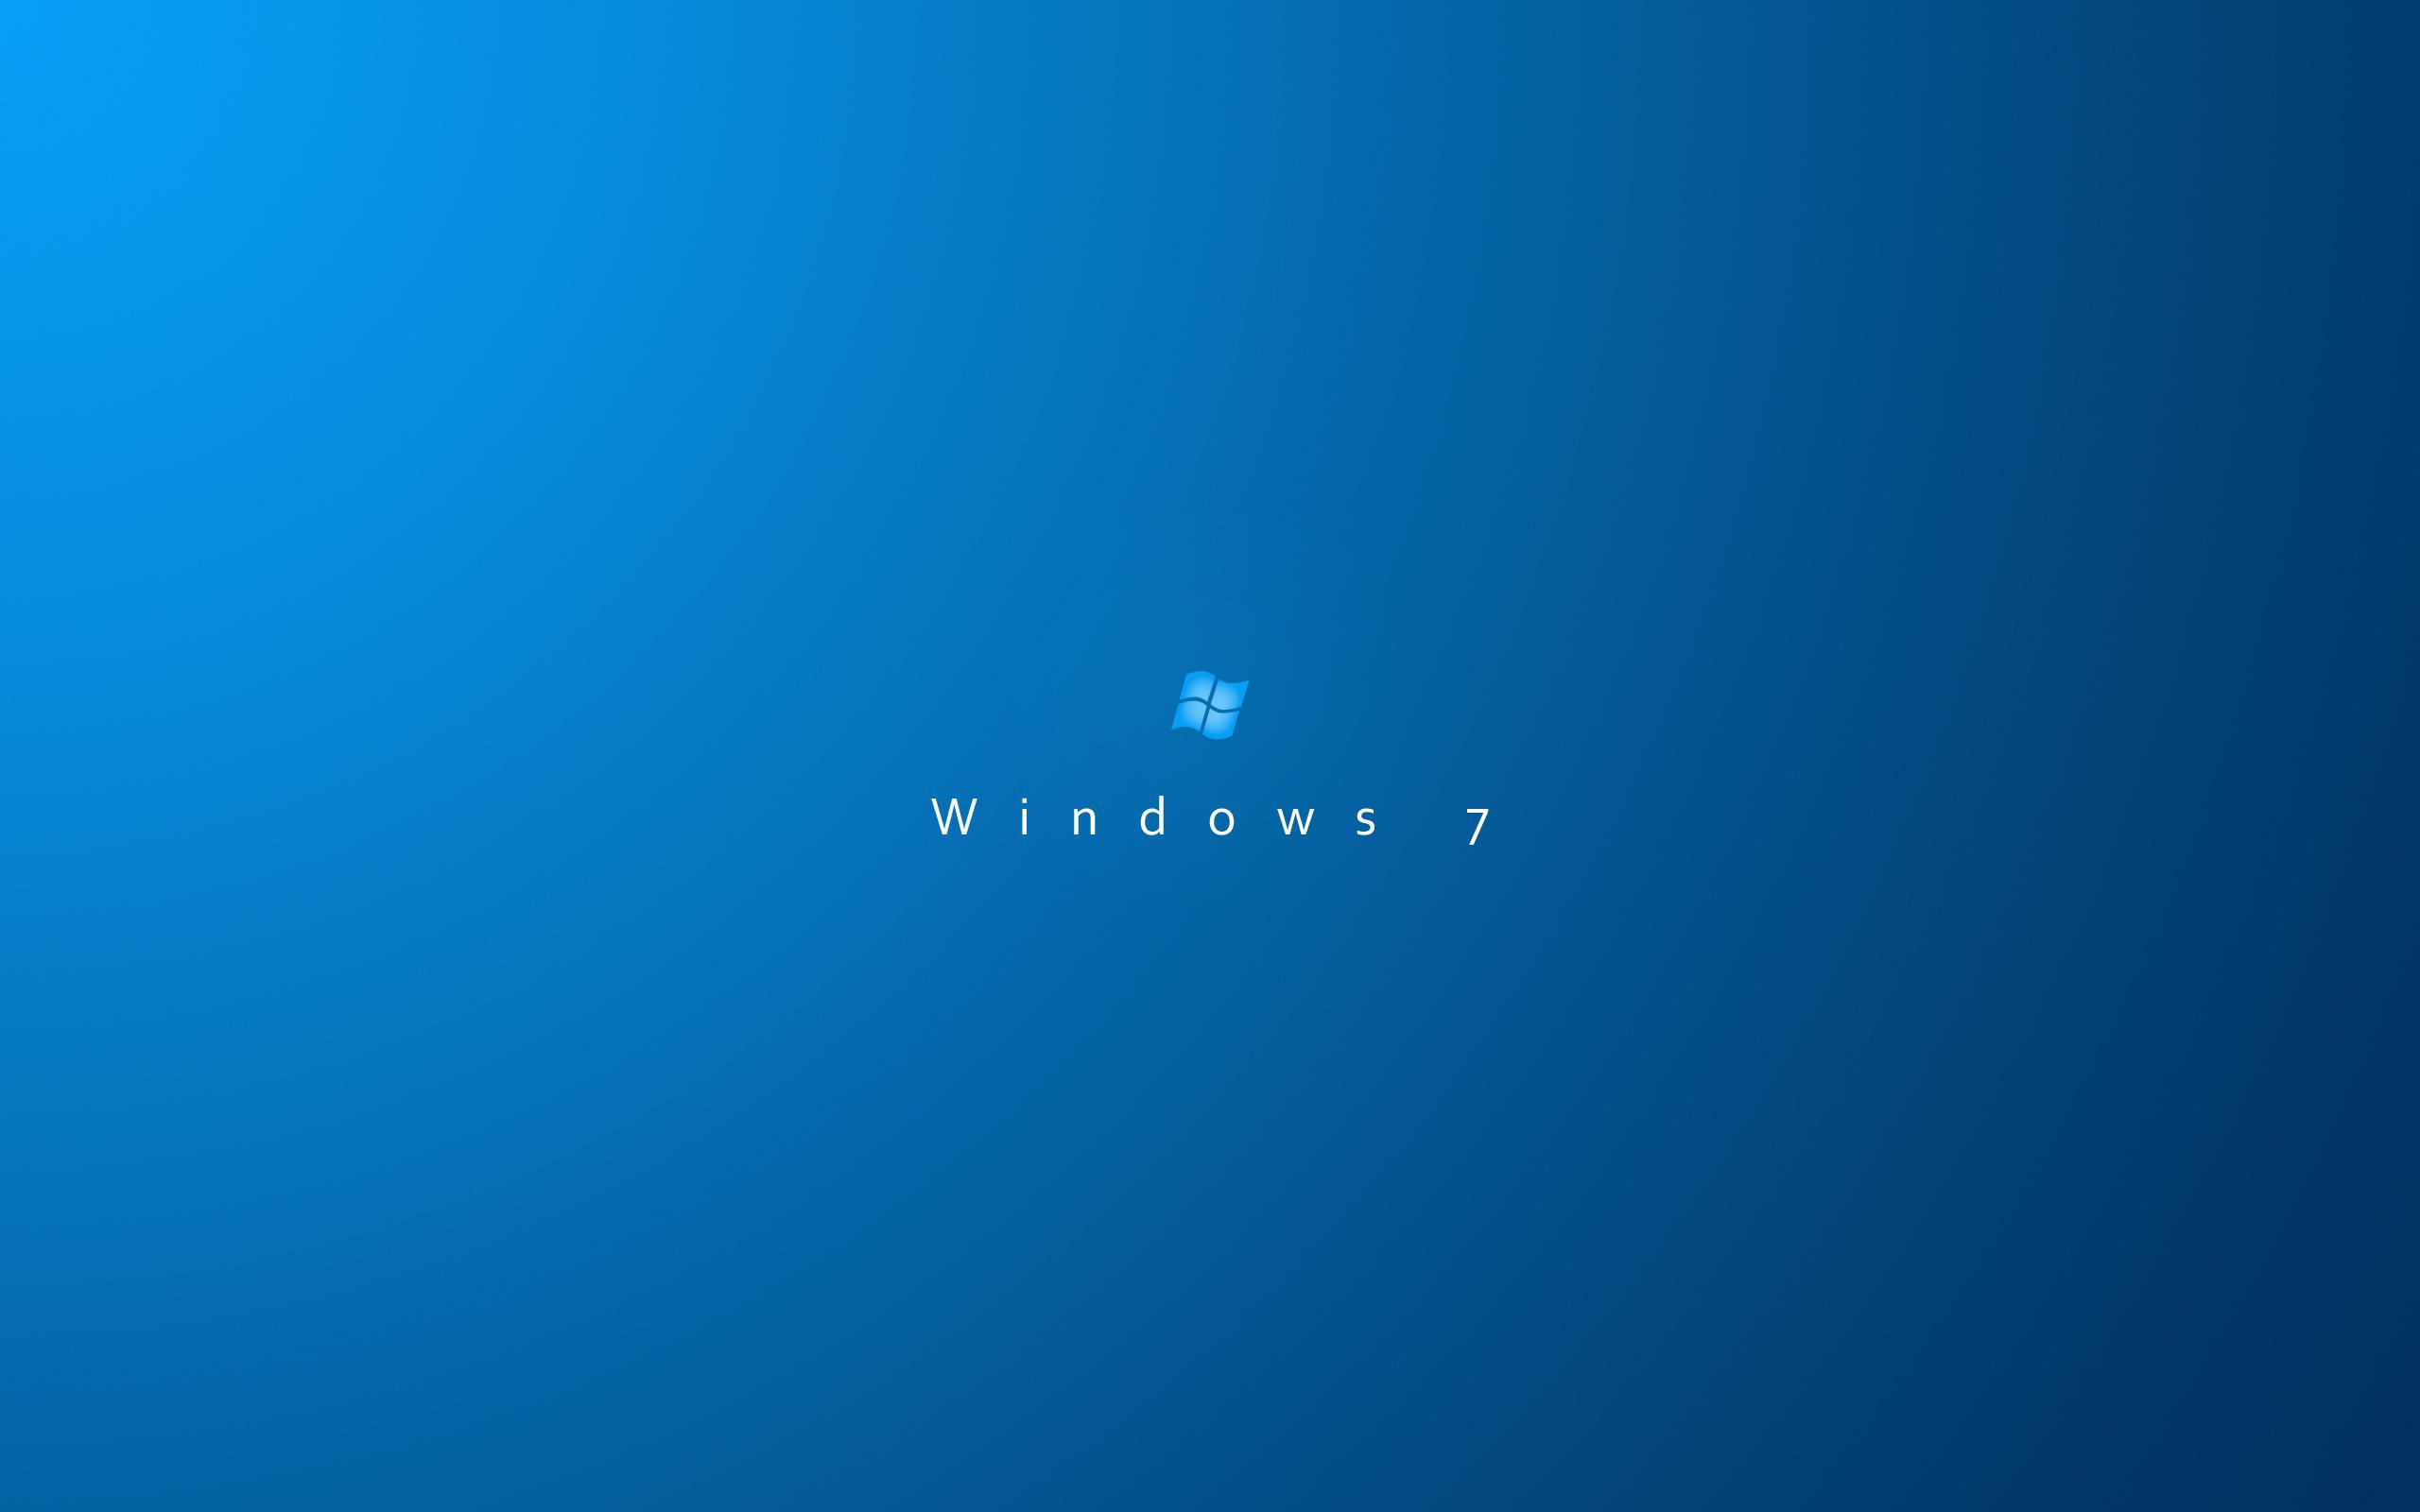 Hi tech windows 7 blue background minimalism wallpaper 2560x1600